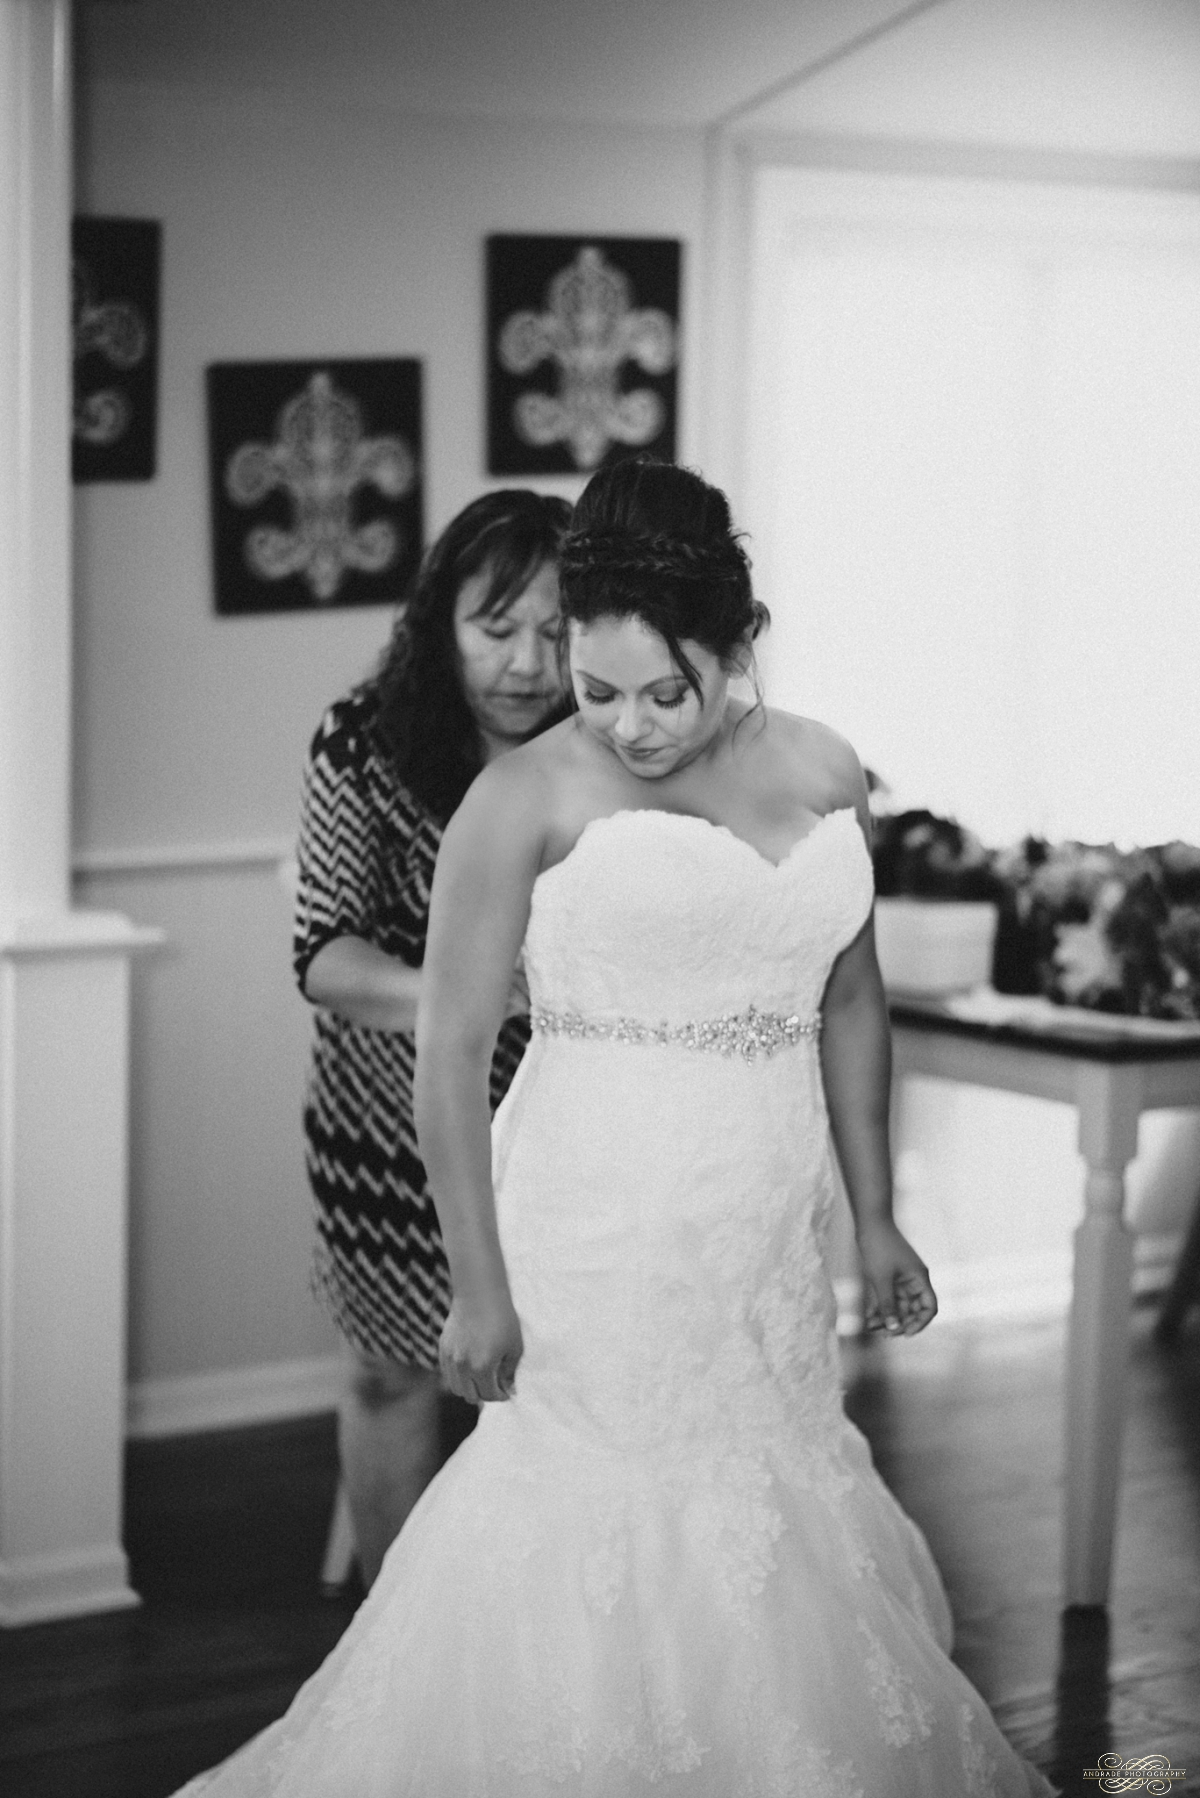 Janette + Louie Estebans Wedding Photography in Naperville - Naperville Wedding Photographer_0016.jpg